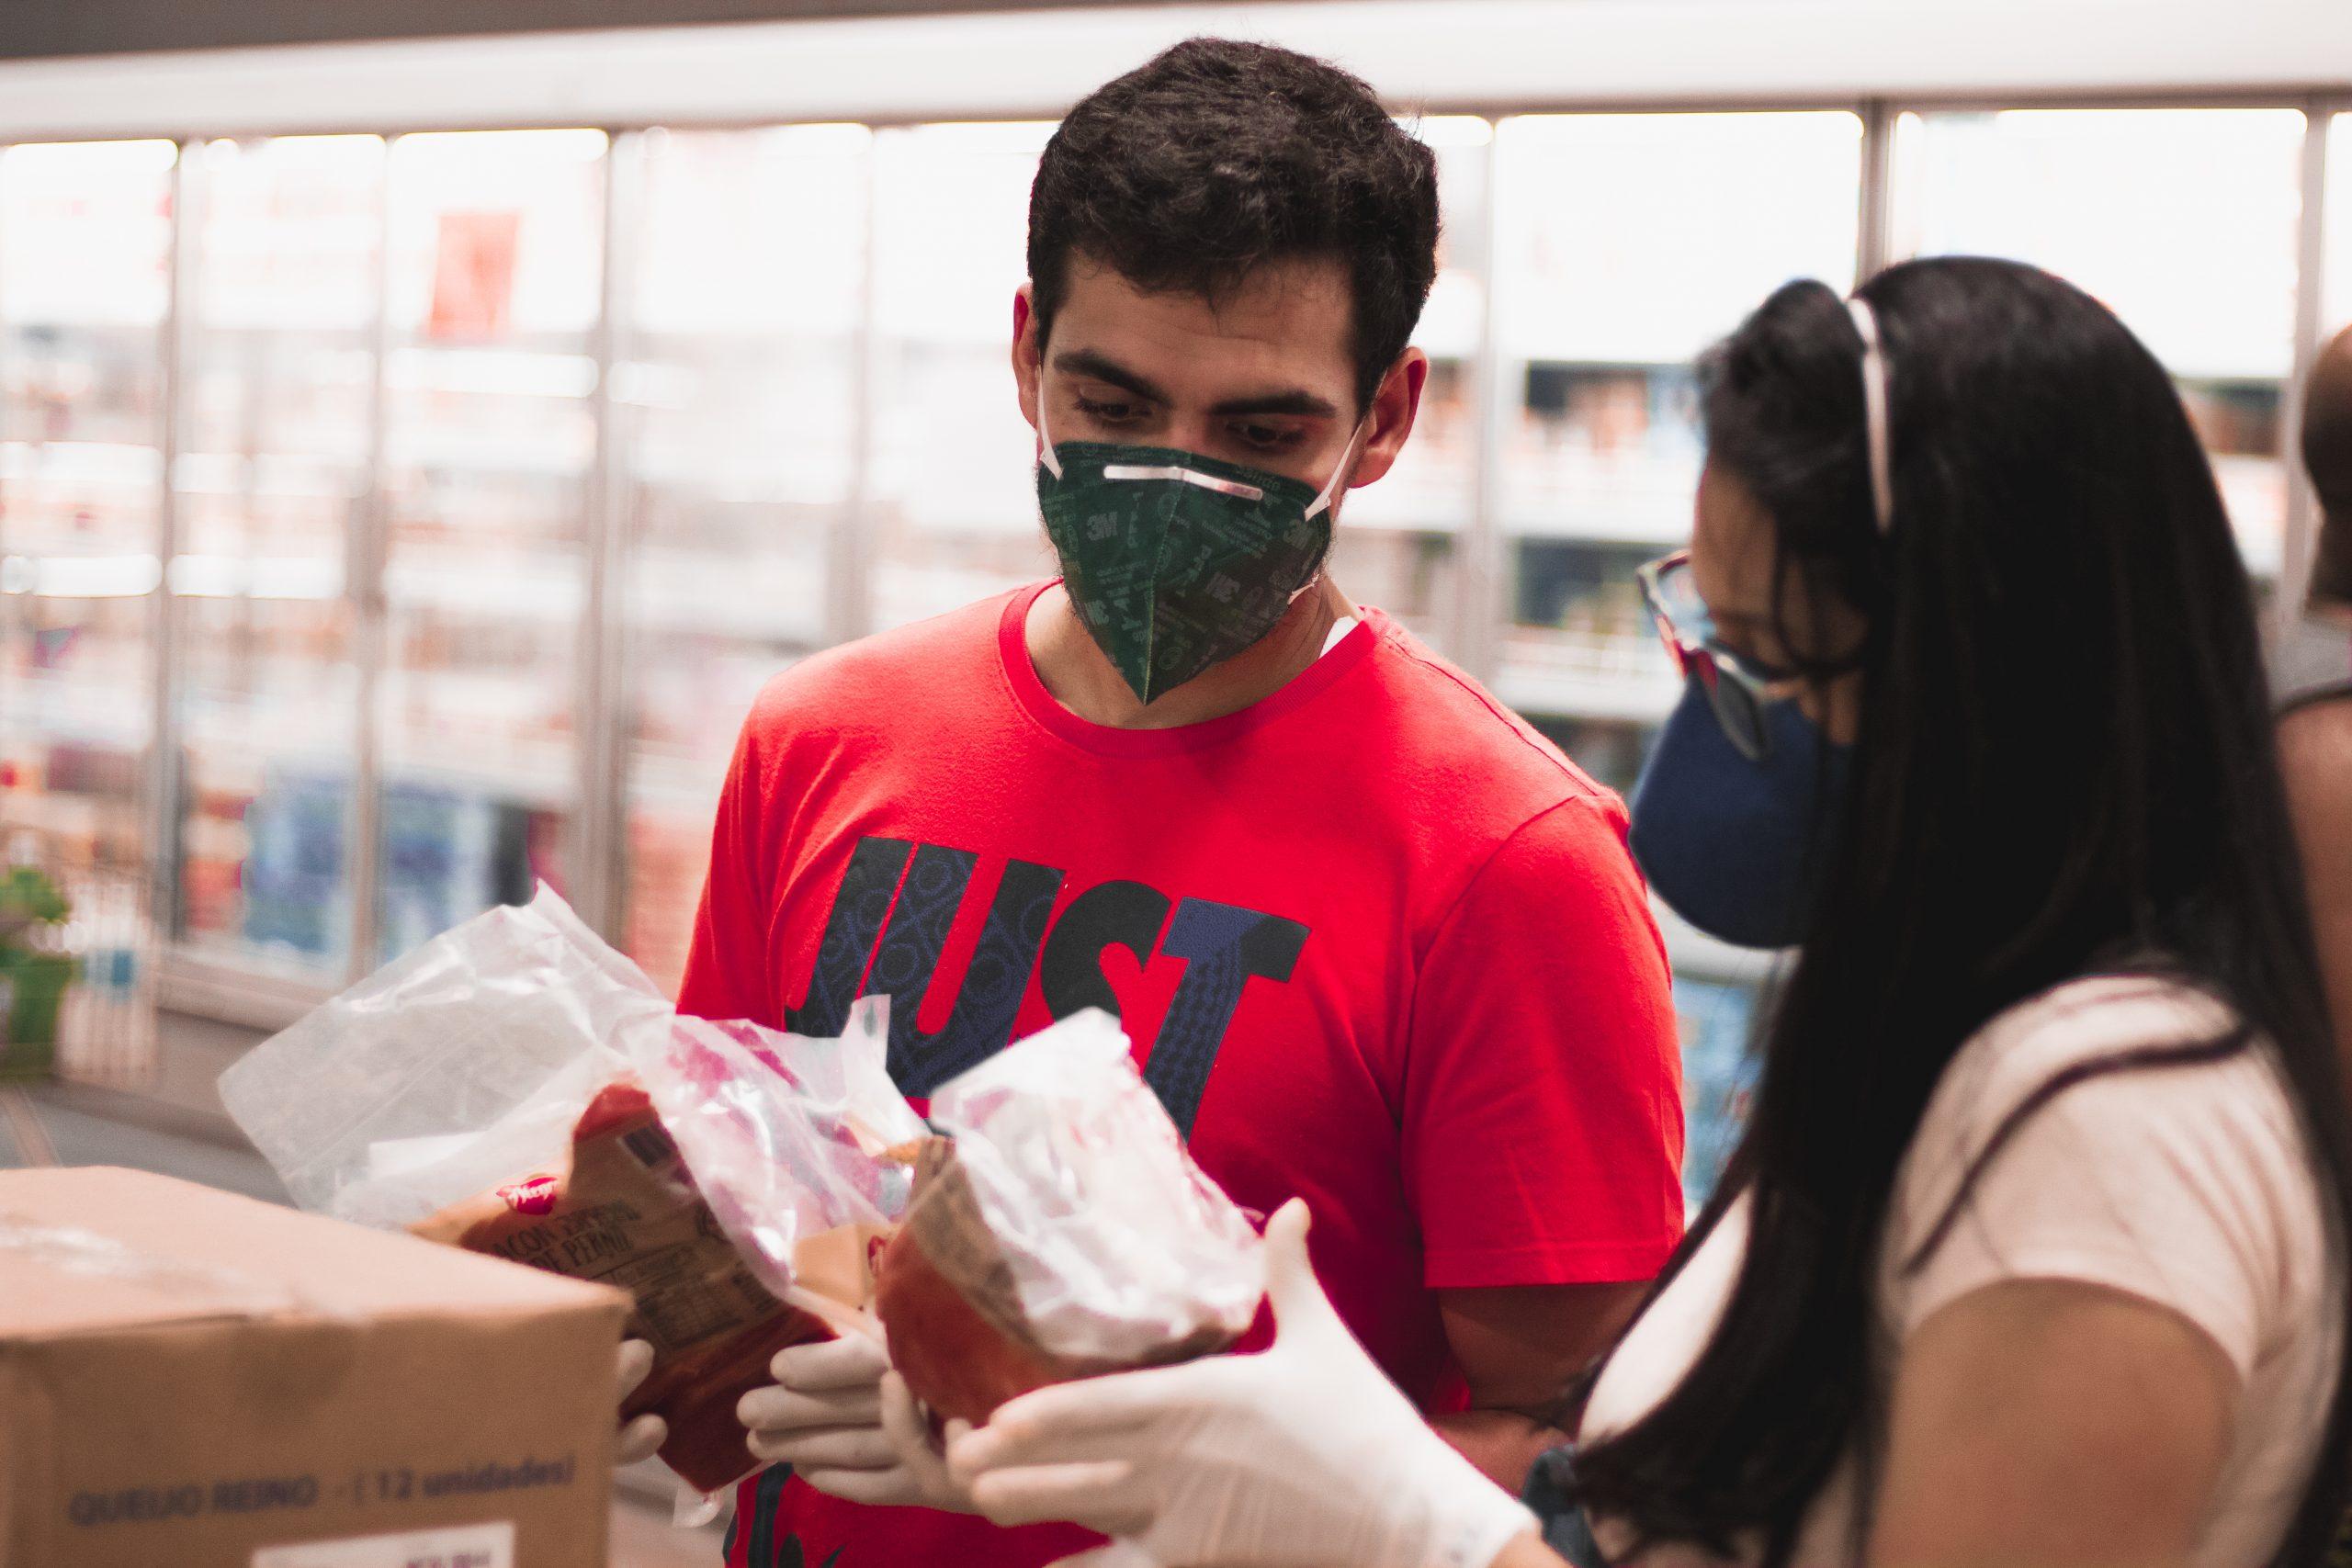 Fotógrafo registra supermercado de Natal pós-Coronavírus